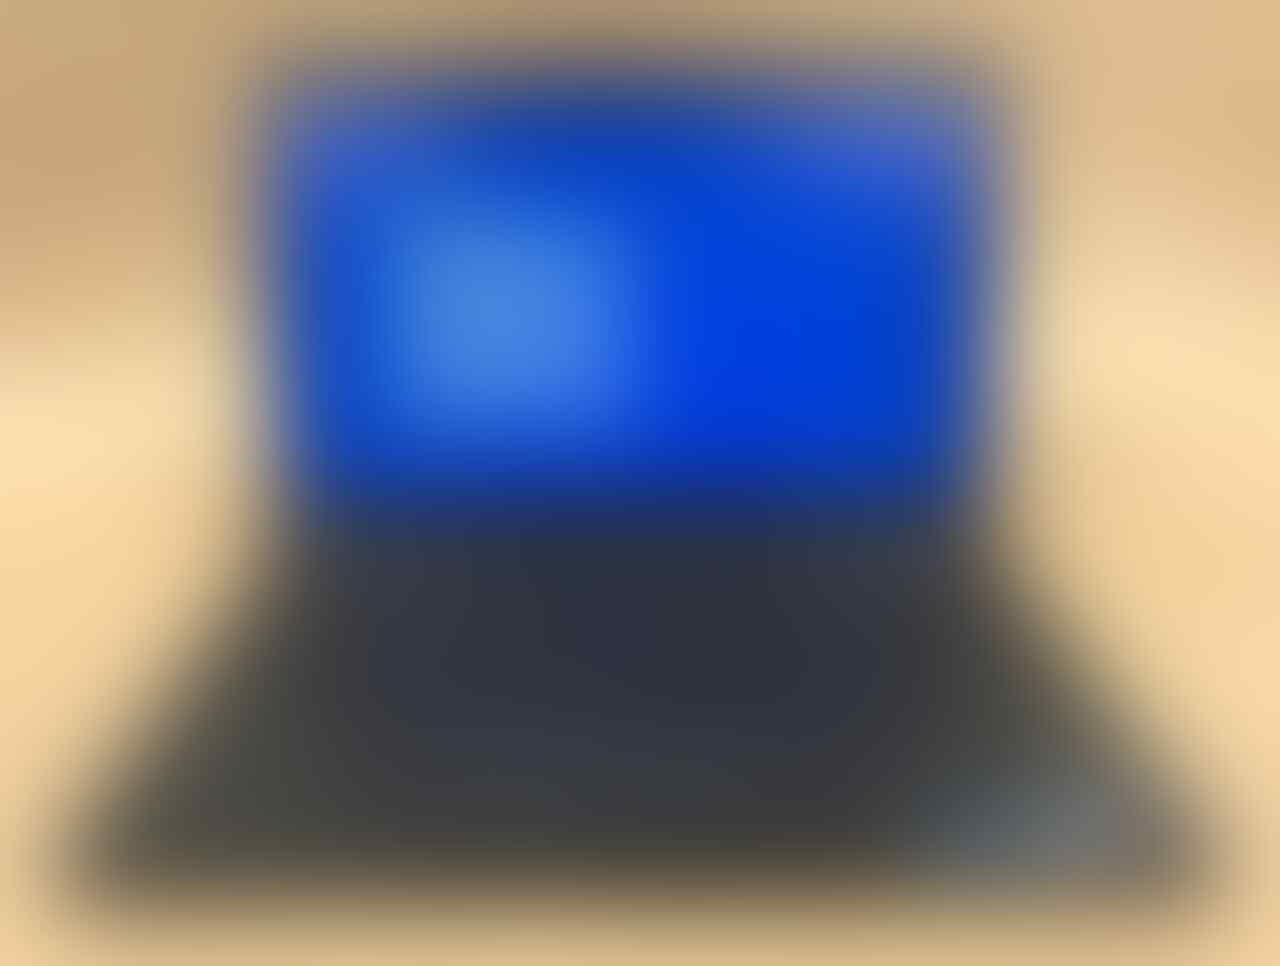 Dell Latitude Core i5 Kabylake RAM 8GB SSD 256GB